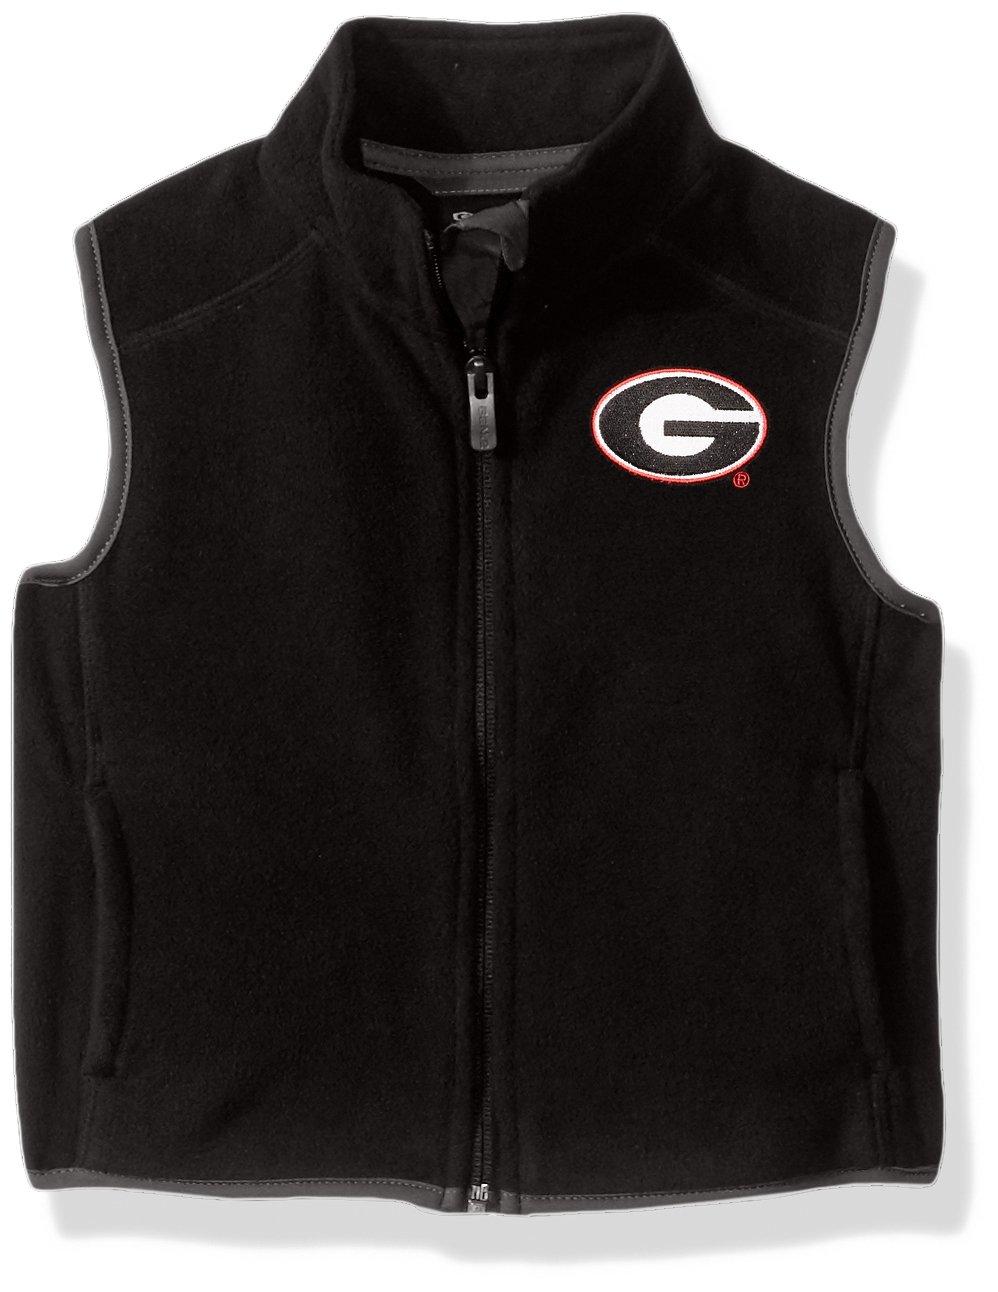 OuterStuff NCAA Boys Scrimmage Fleece Vest